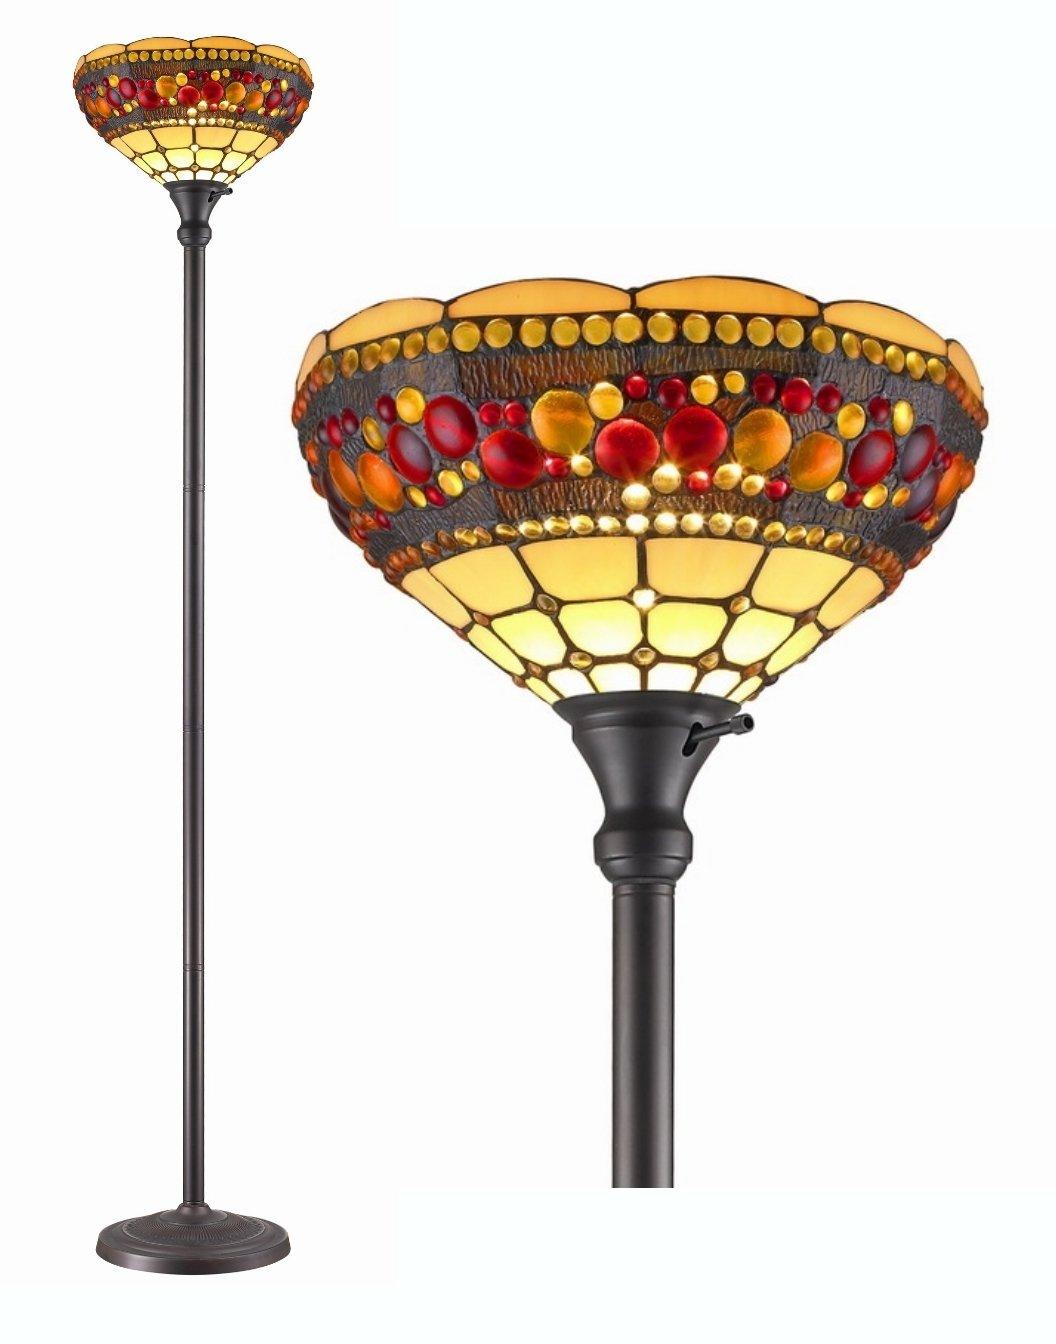 Amora Lighting AM1045FL14 Tiffany Style Jeweled Torchiere Floor Lamp by Amora Lighting